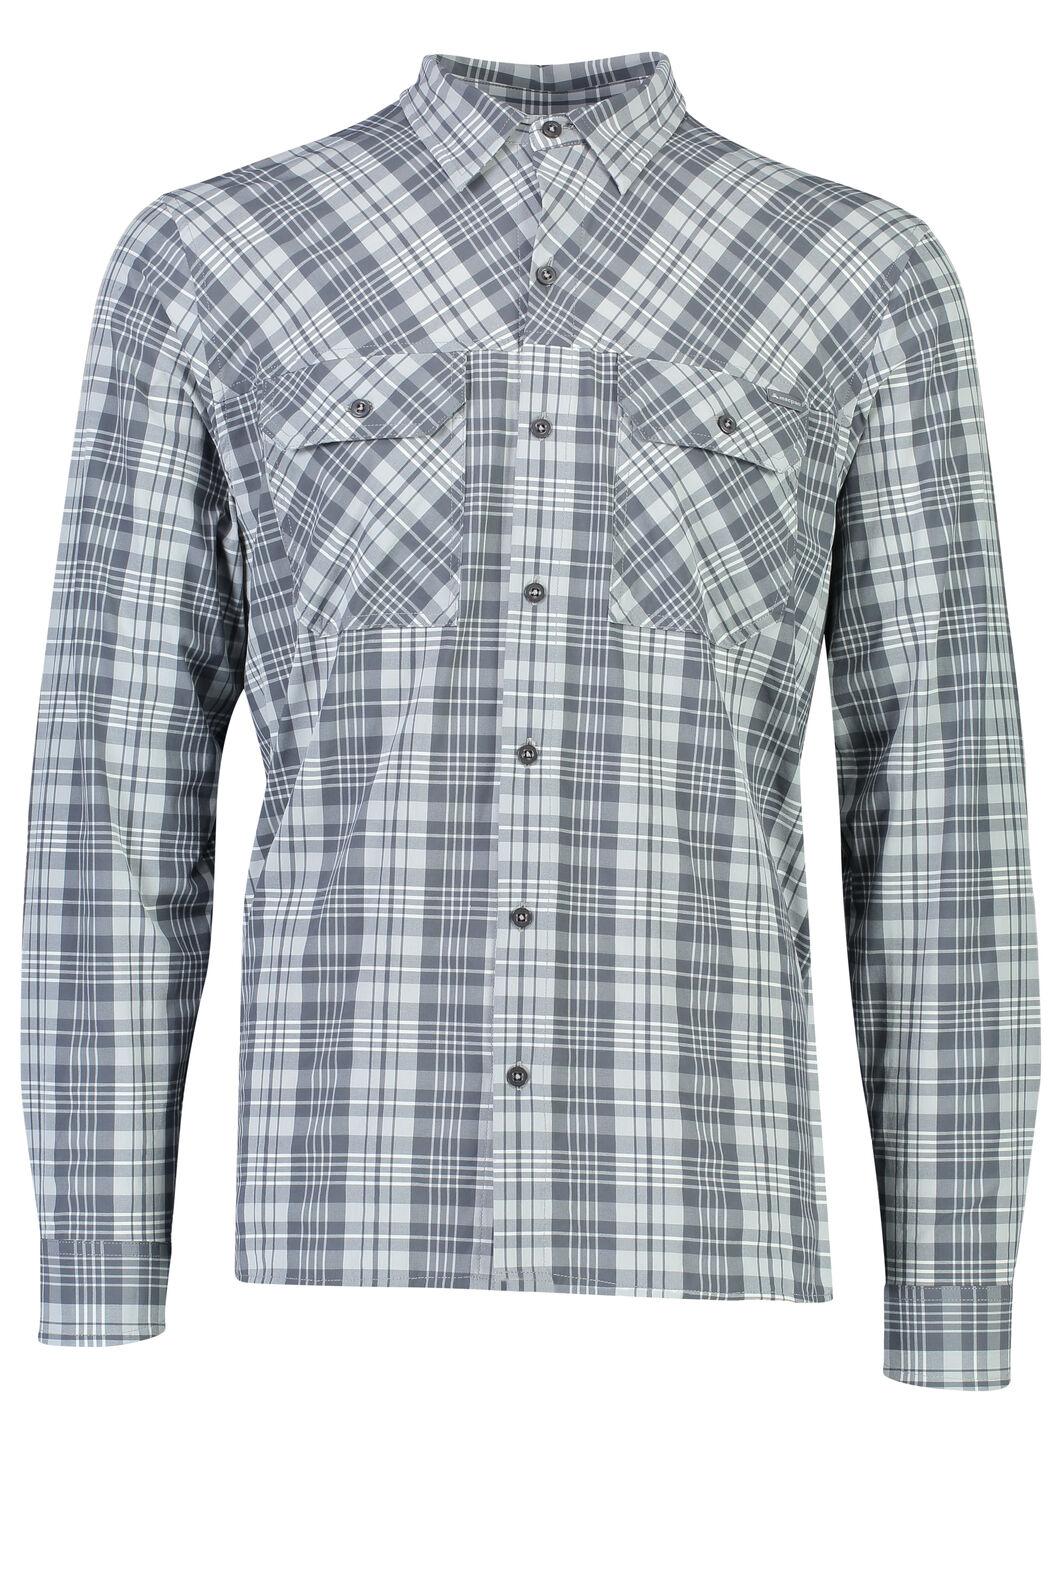 Macpac Eclipse Long Sleeve Shirt - Men's, Iron Gate, hi-res